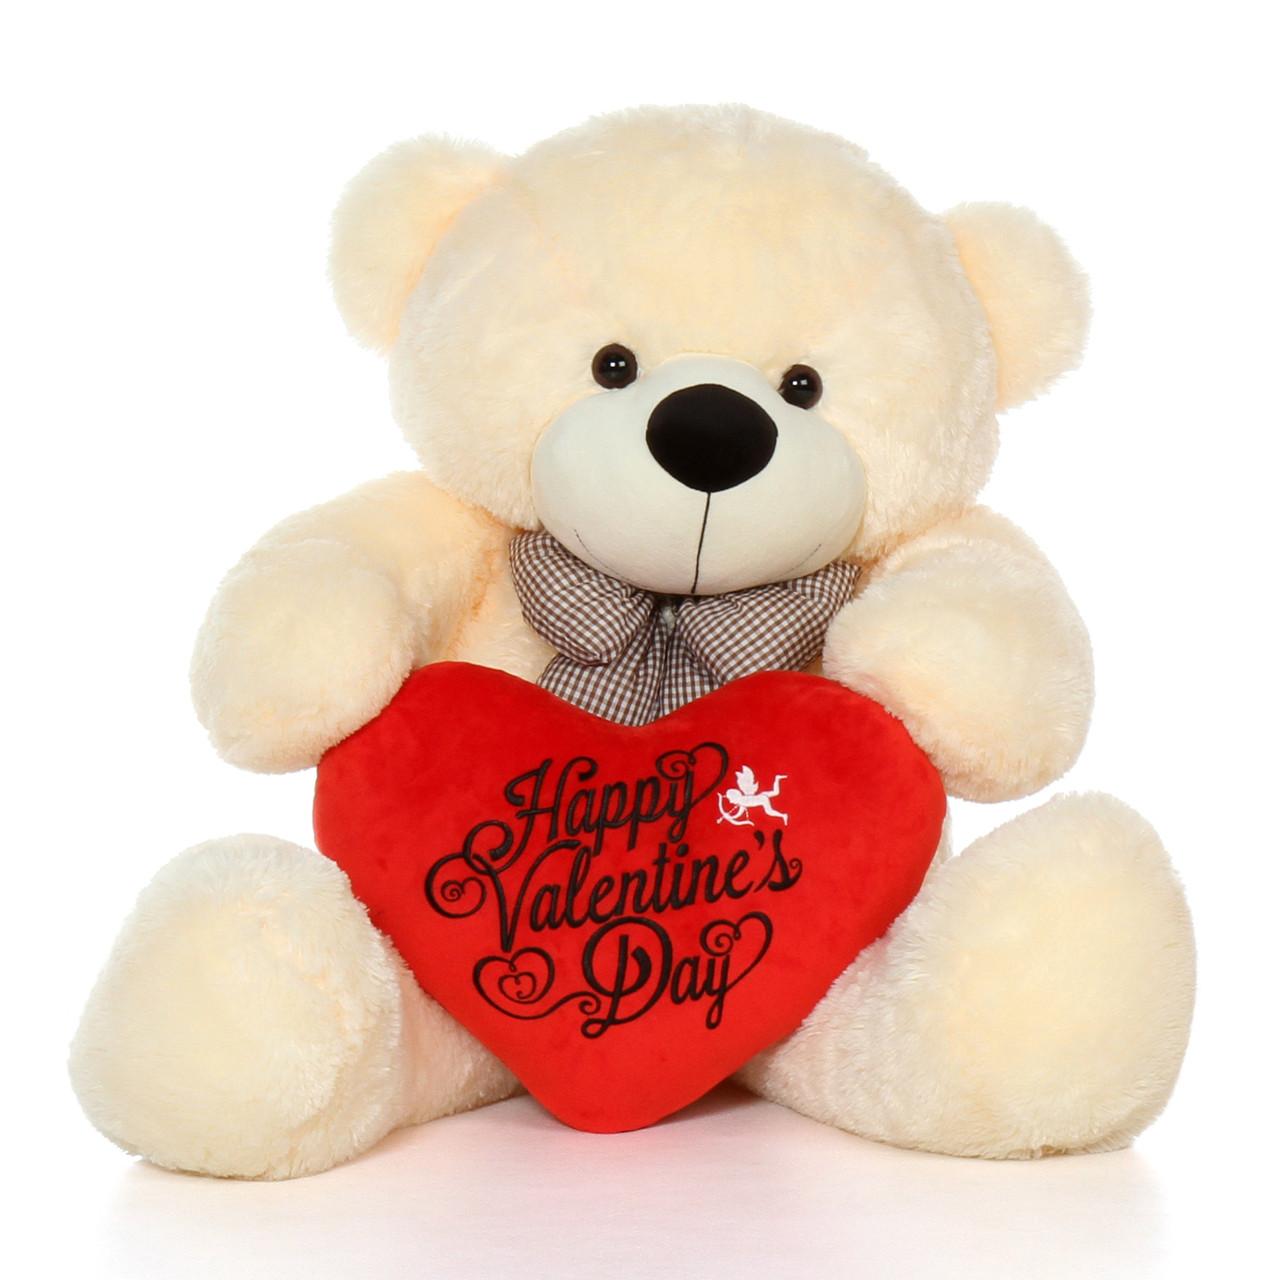 Valentines Day Teddy Bears Wholesale Valentine Gift Ideas